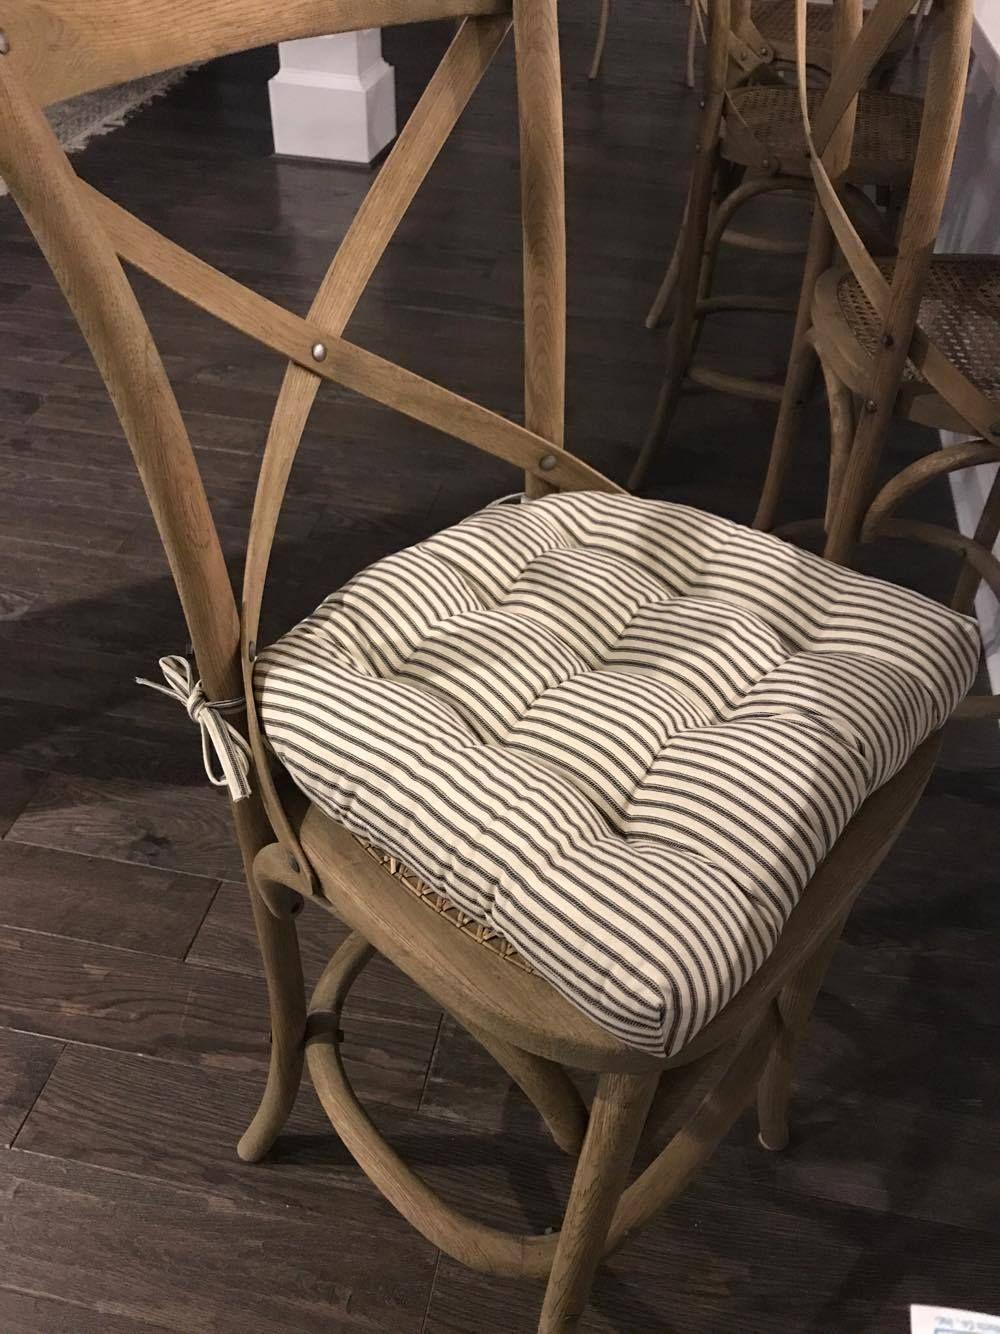 Ticking Stripe Black Dining Chair Pad – Reversible, Latex Foam Fill